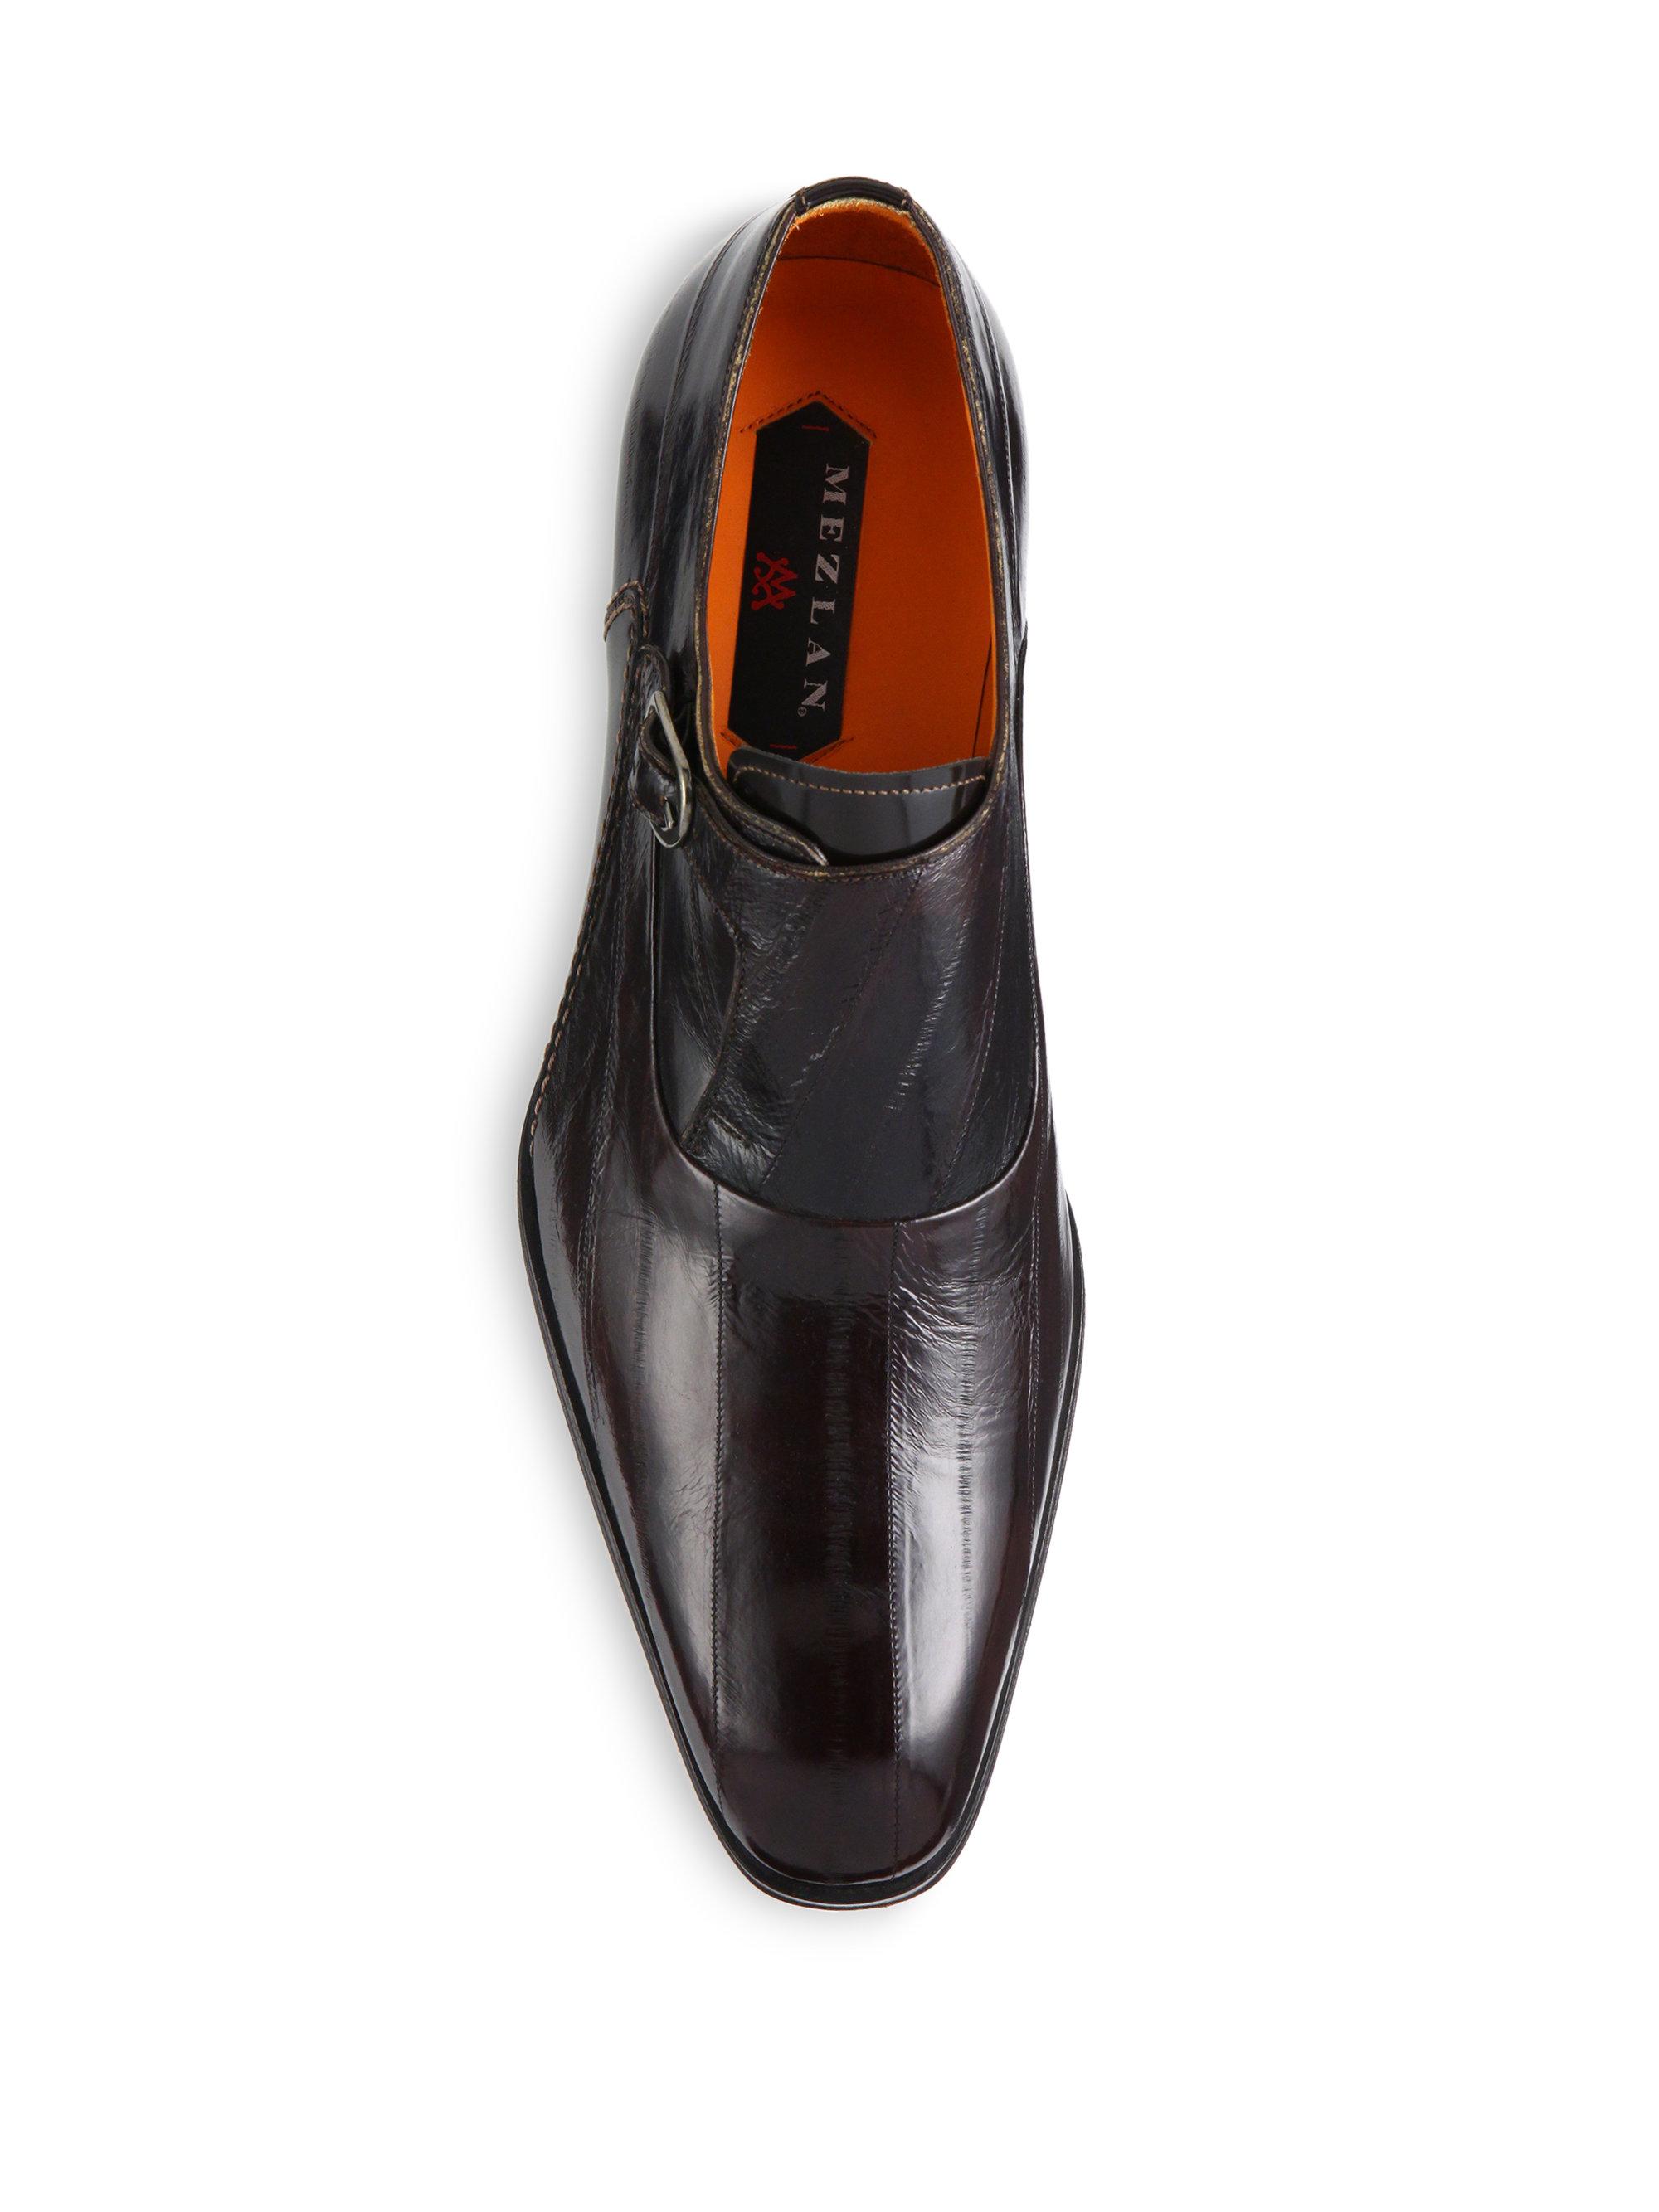 Fabi Brown Monk Shoes